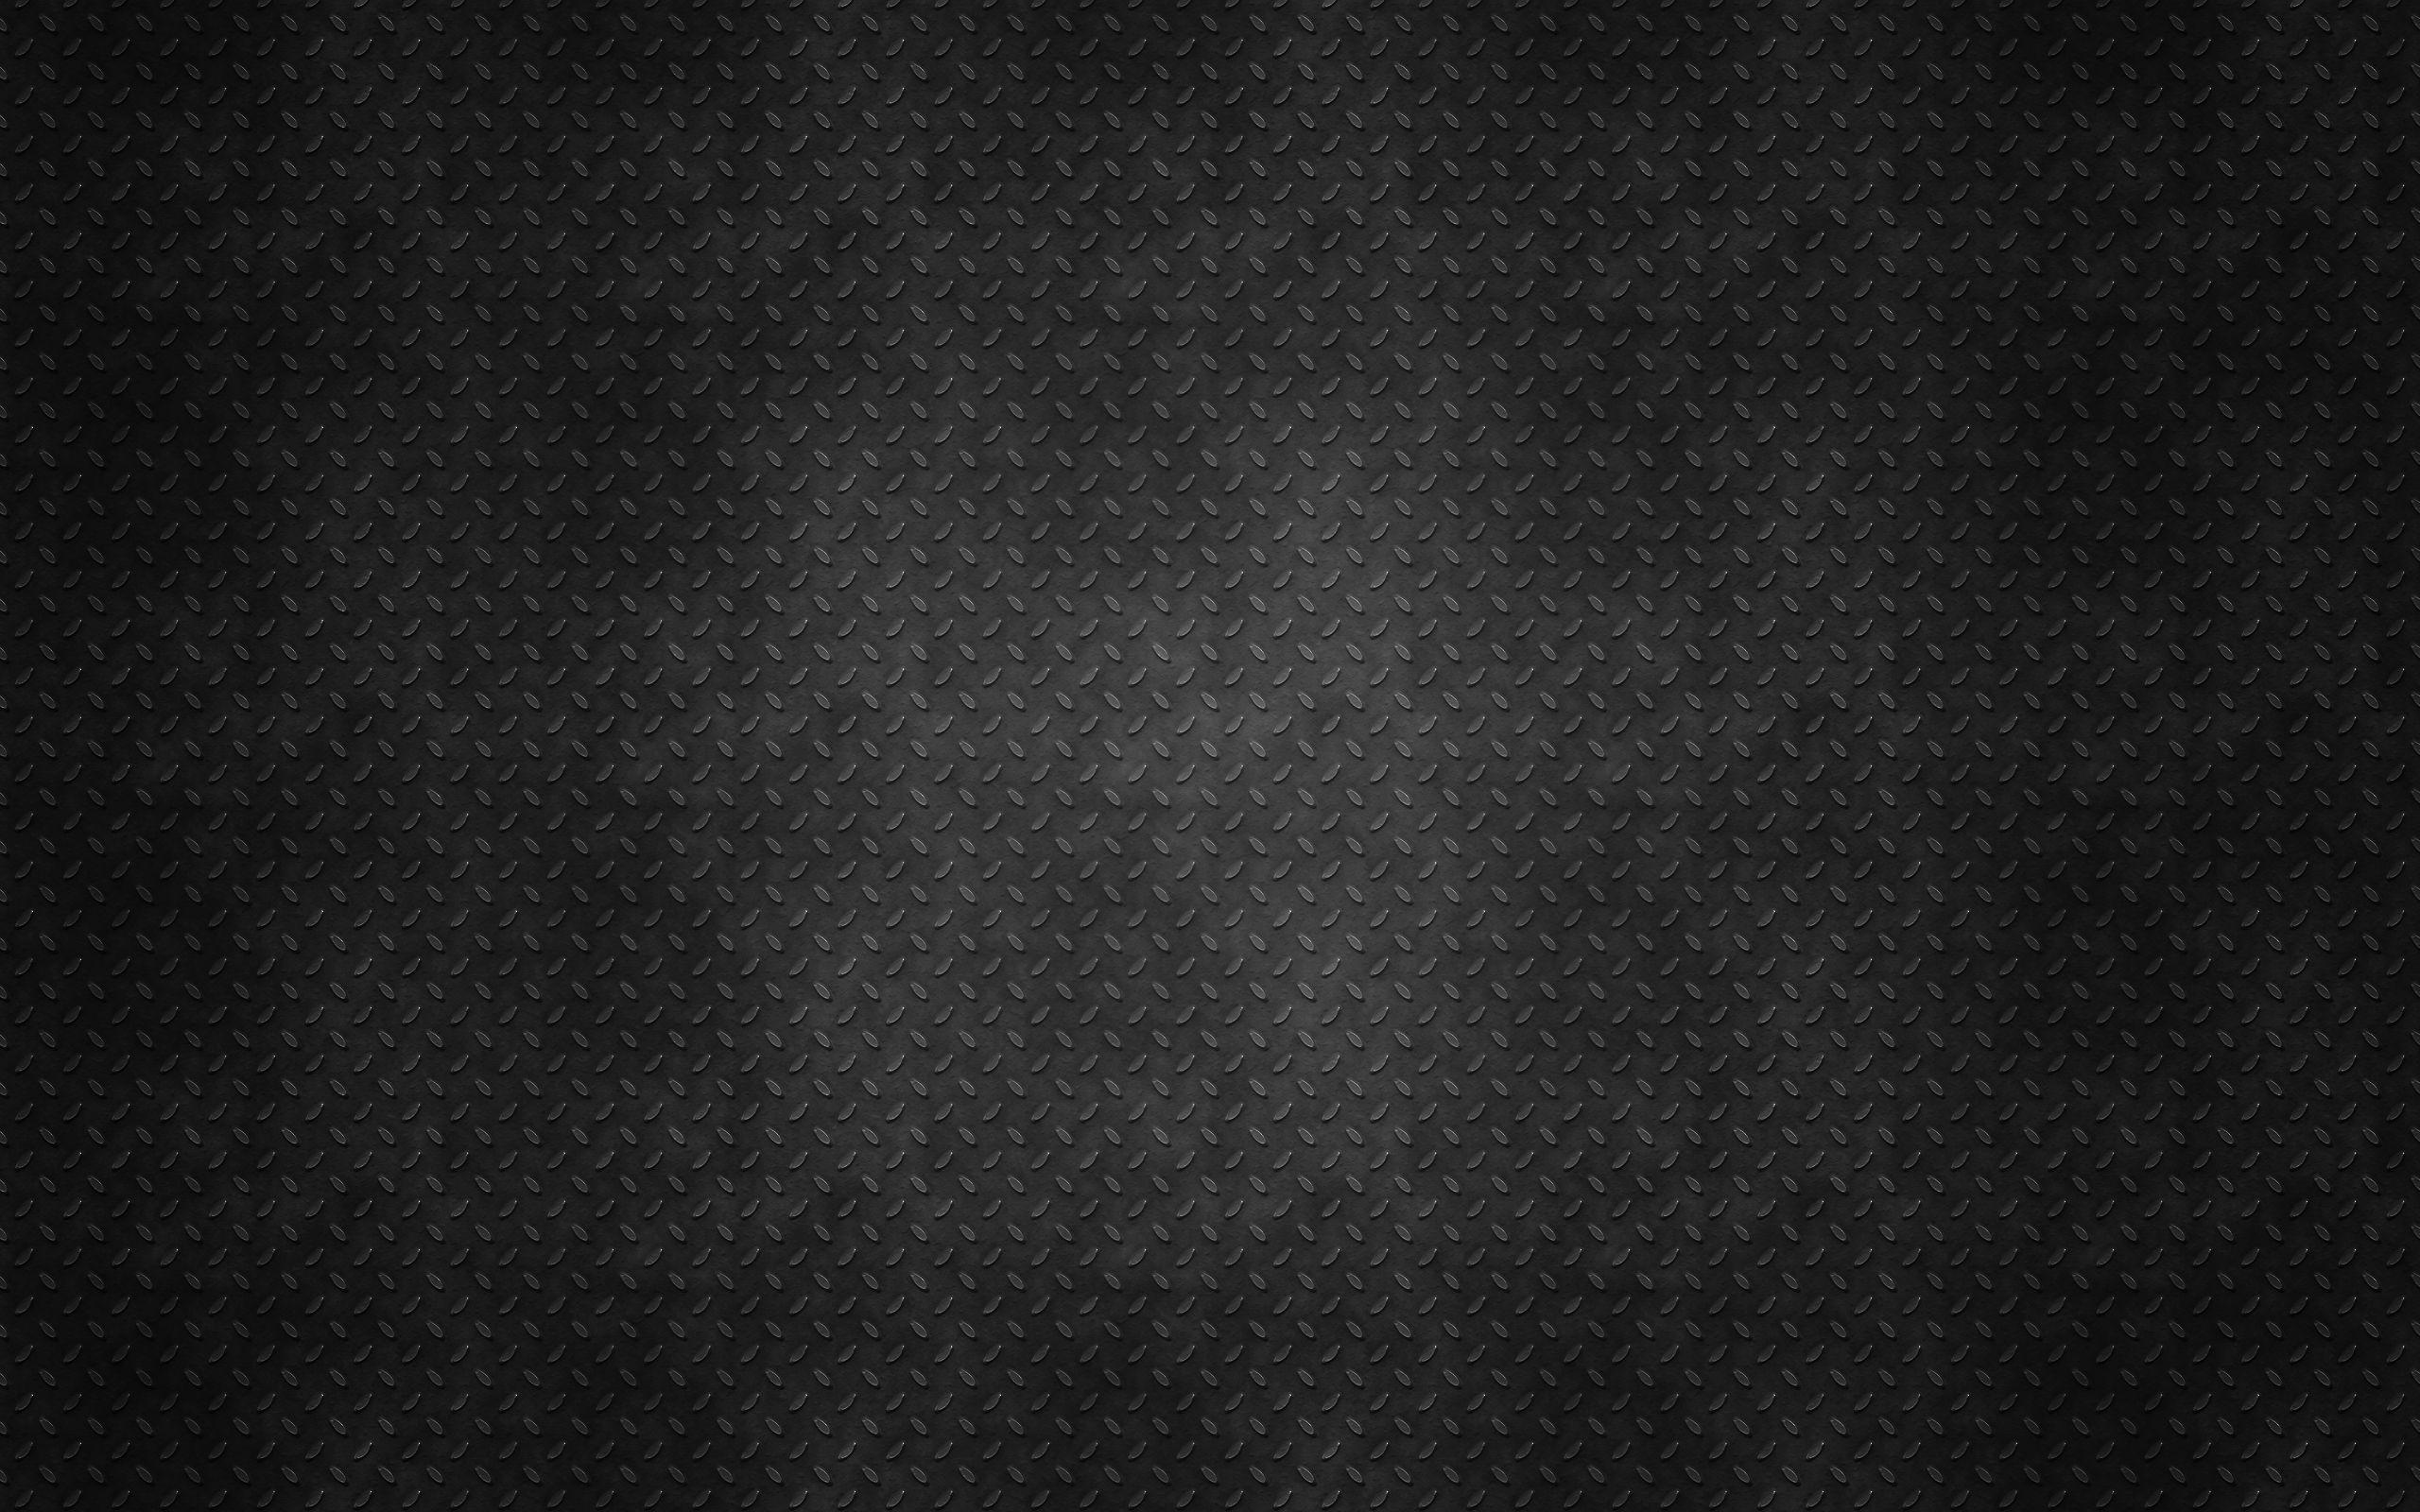 Metallic texture Wallpaper 3404 2560x1600